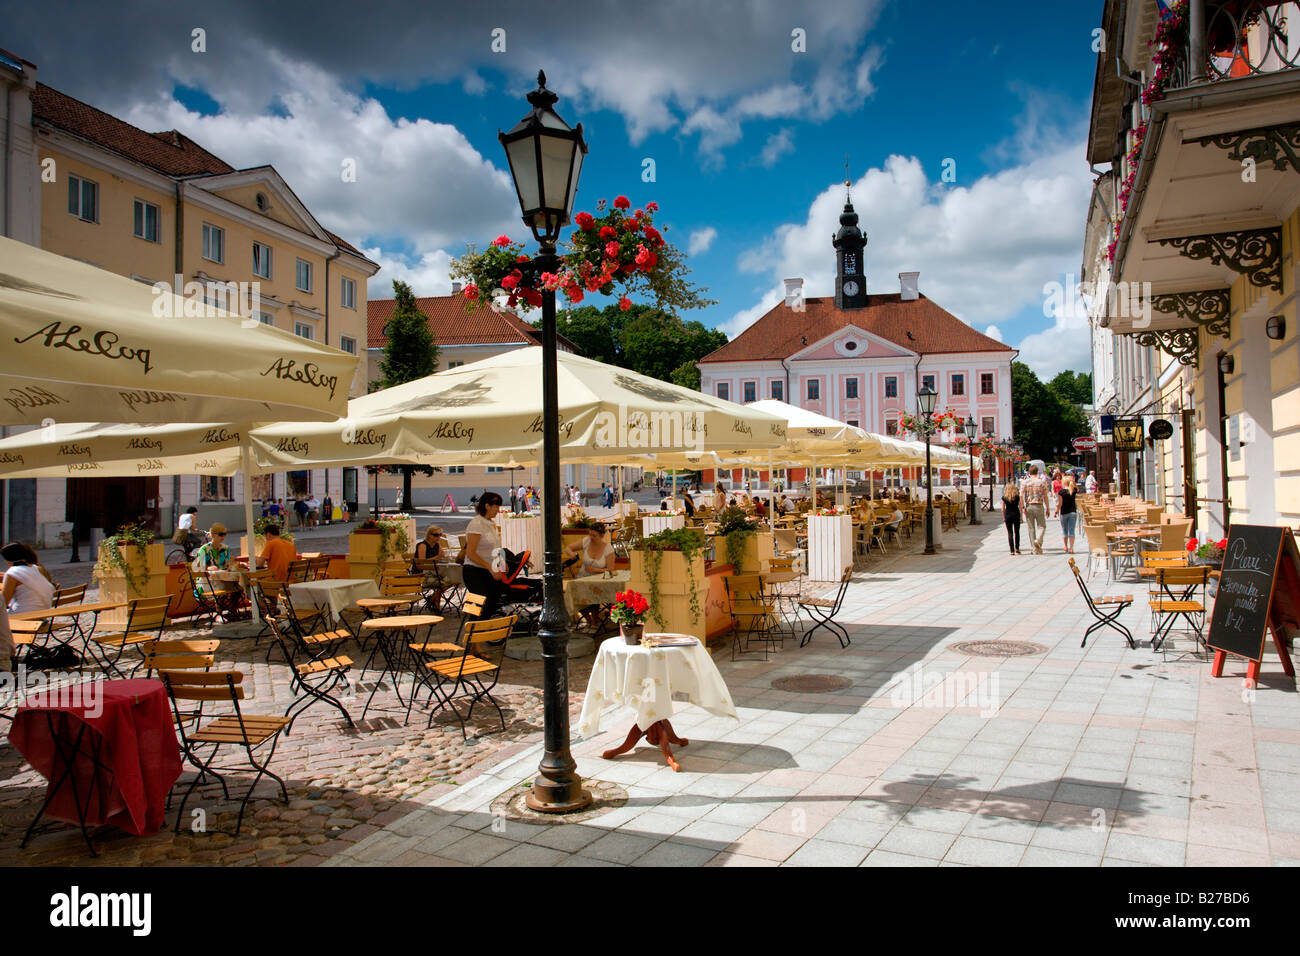 c89381513ae Estonia: Tartu Town Hall Square: Outdoors Restaurant Stock Photo ...